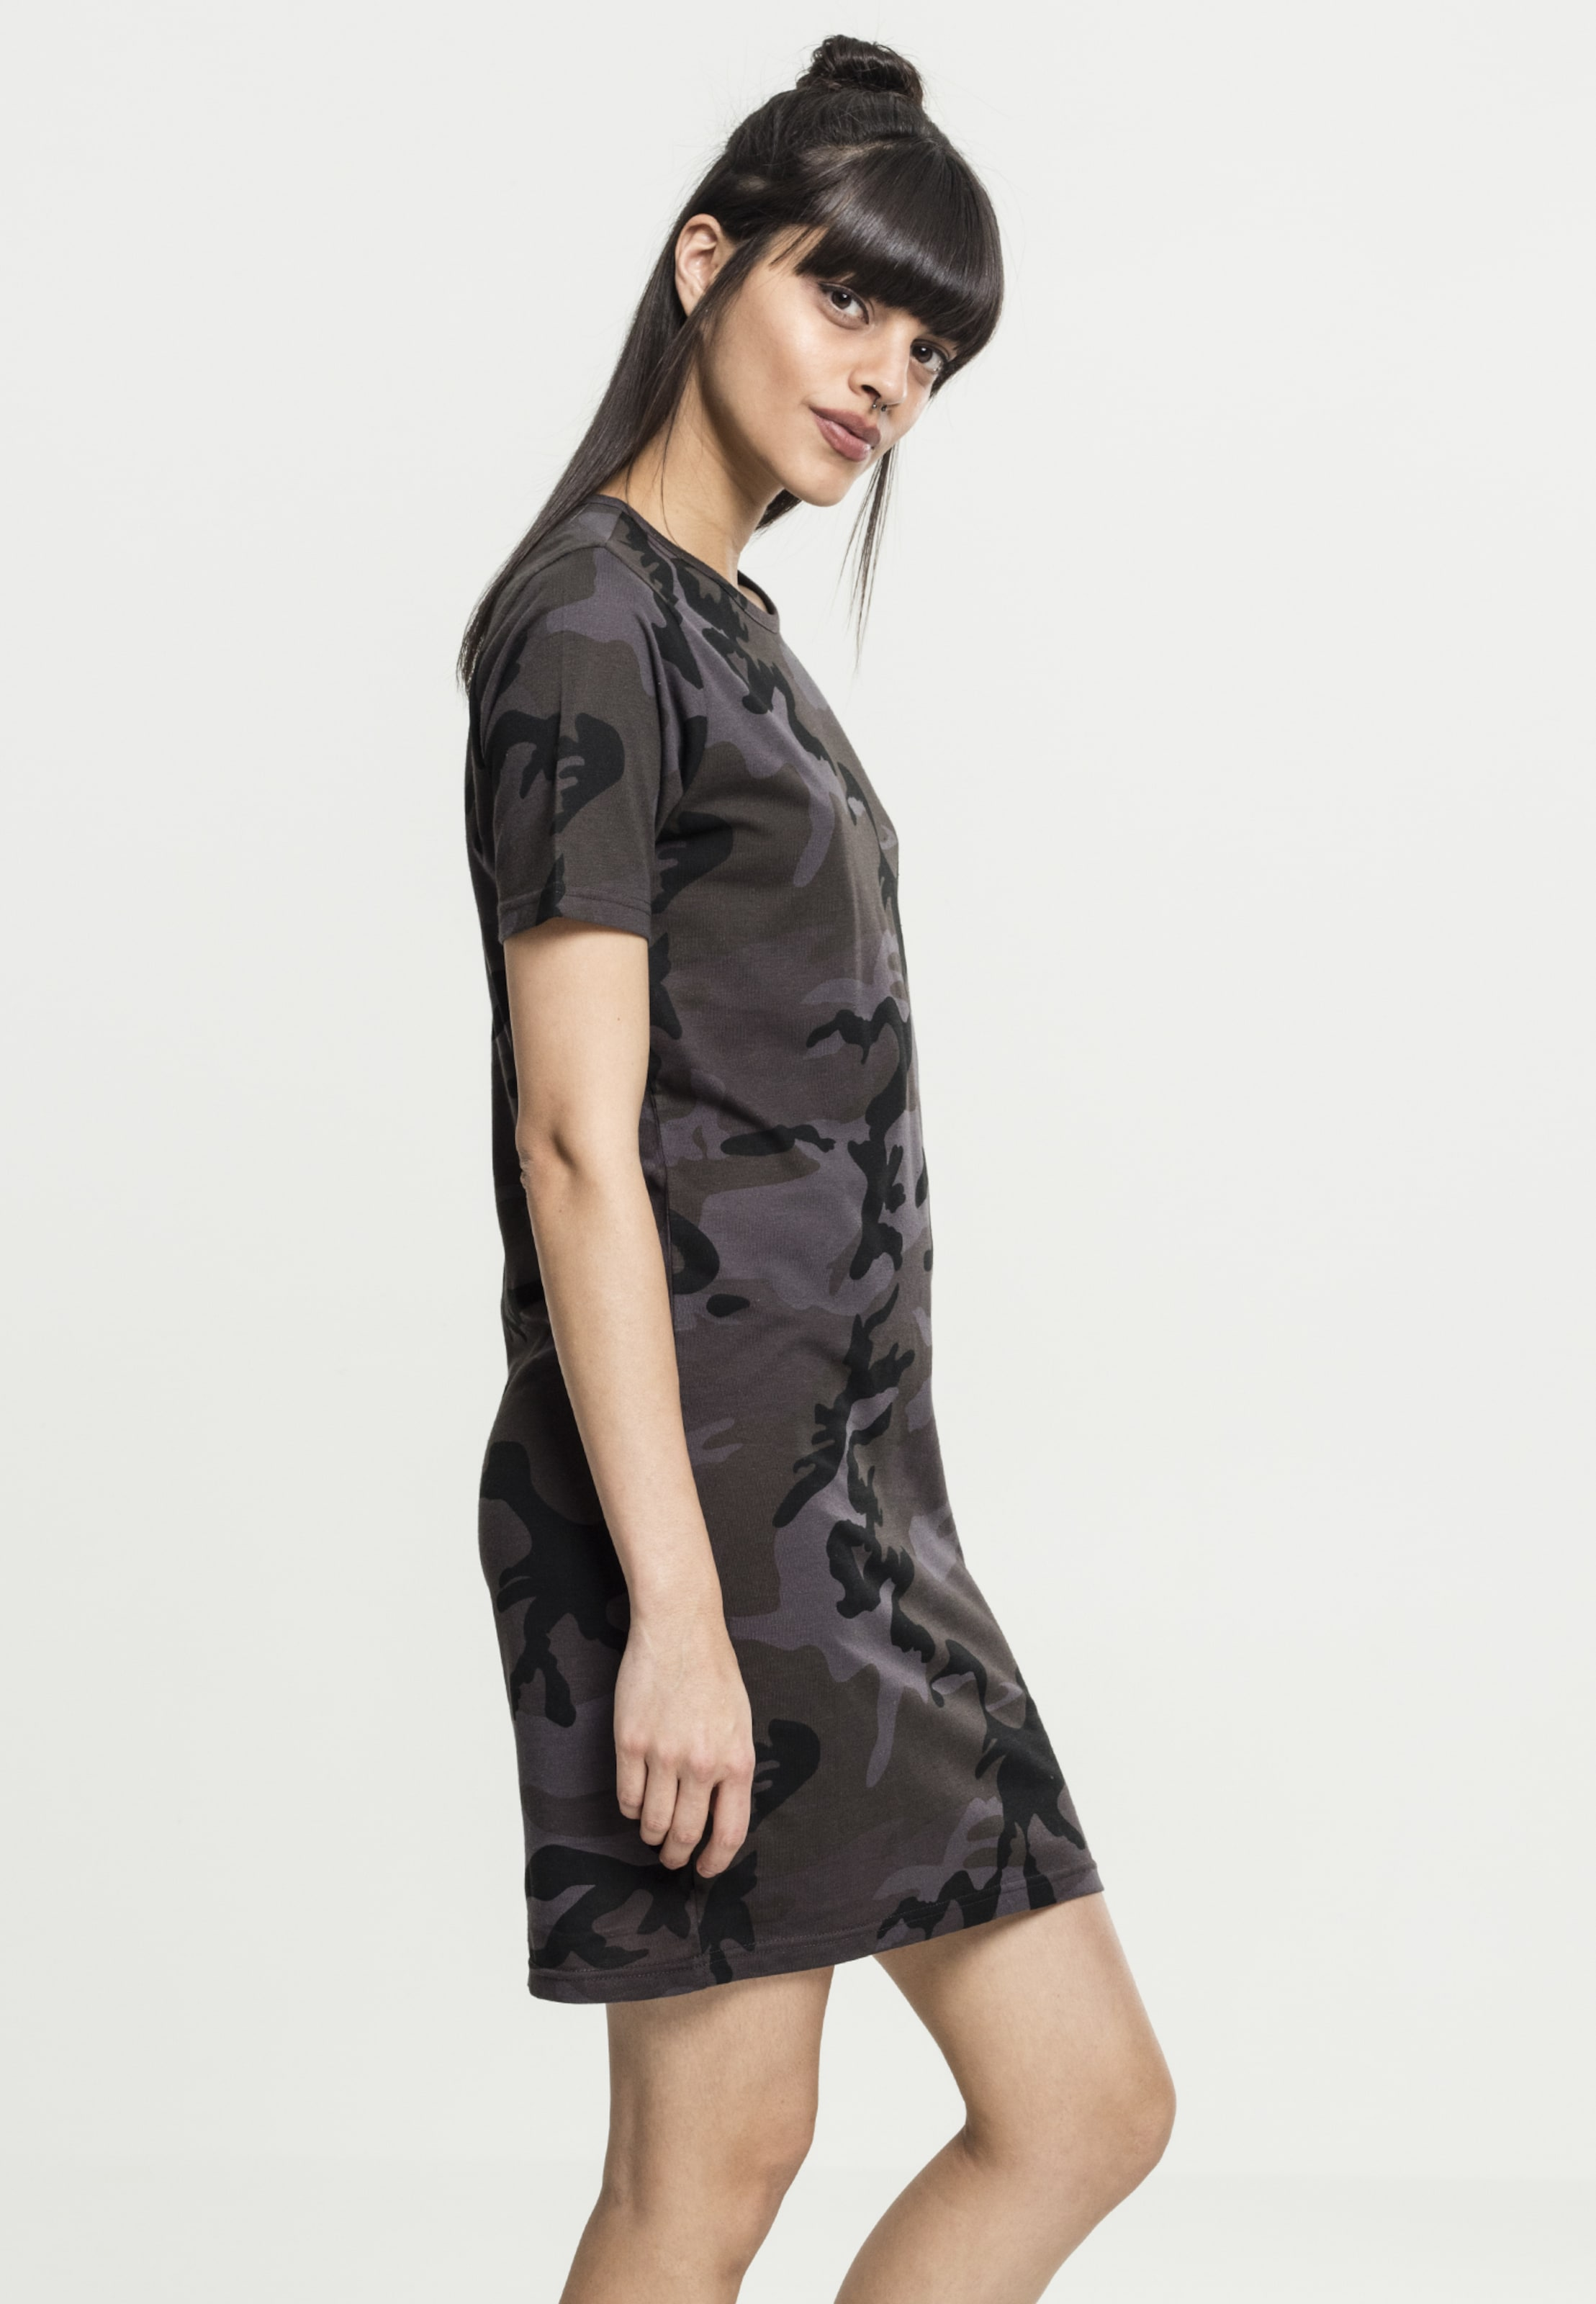 In Tee KhakiSchwarz Urban dress Classics KulFcT153J